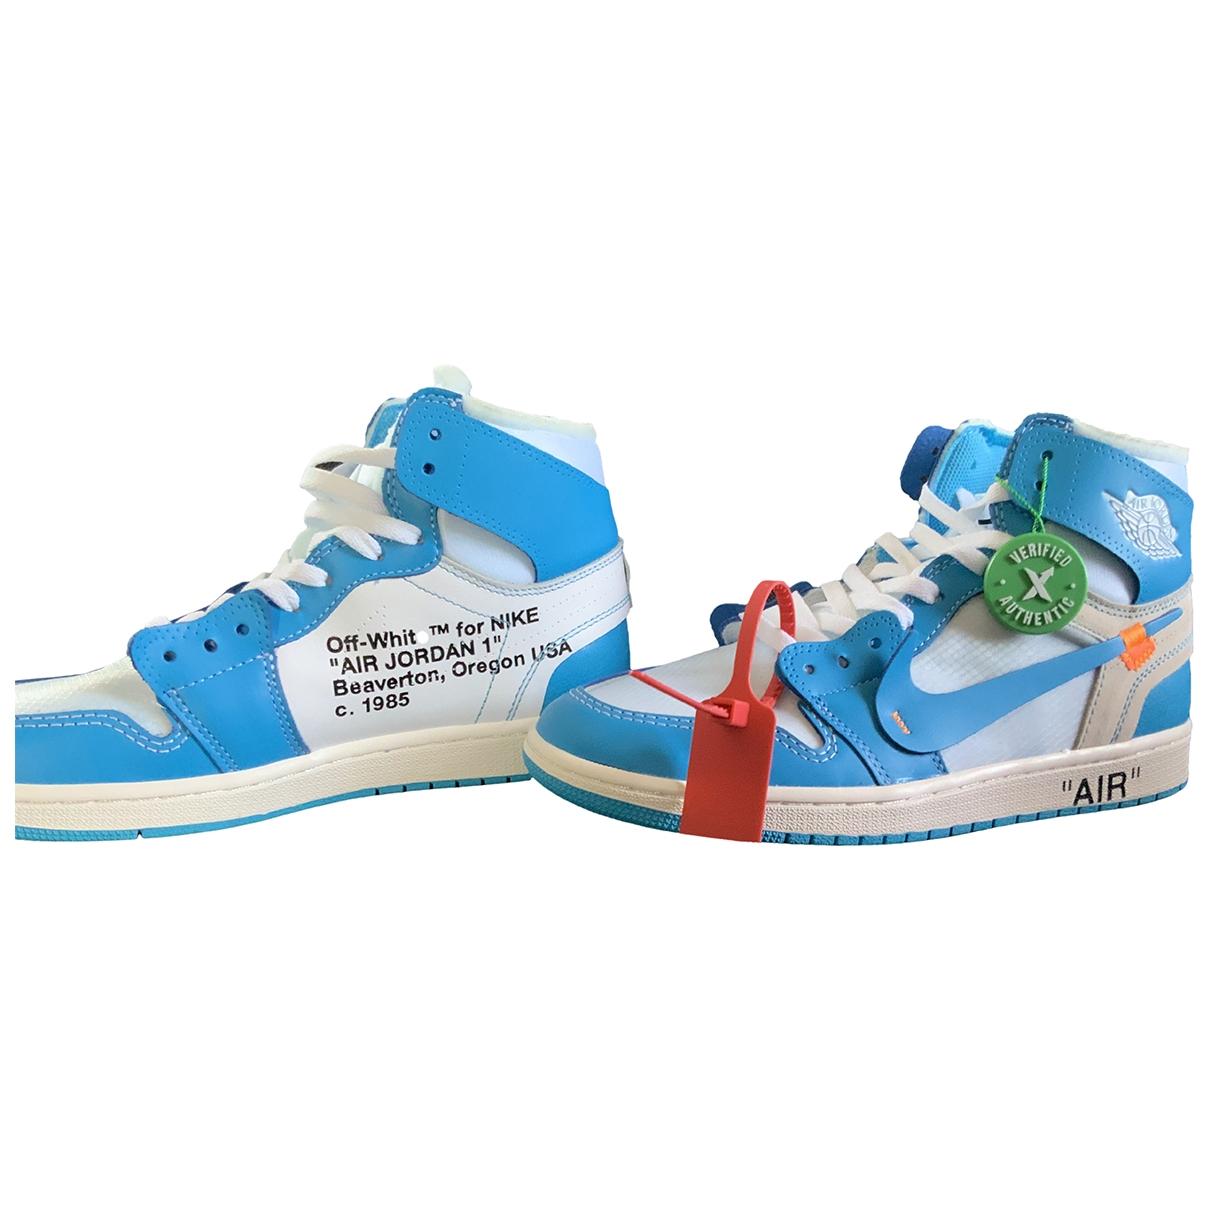 Nike X Off-white - Baskets Air Jordan 1 pour homme en cuir - bleu